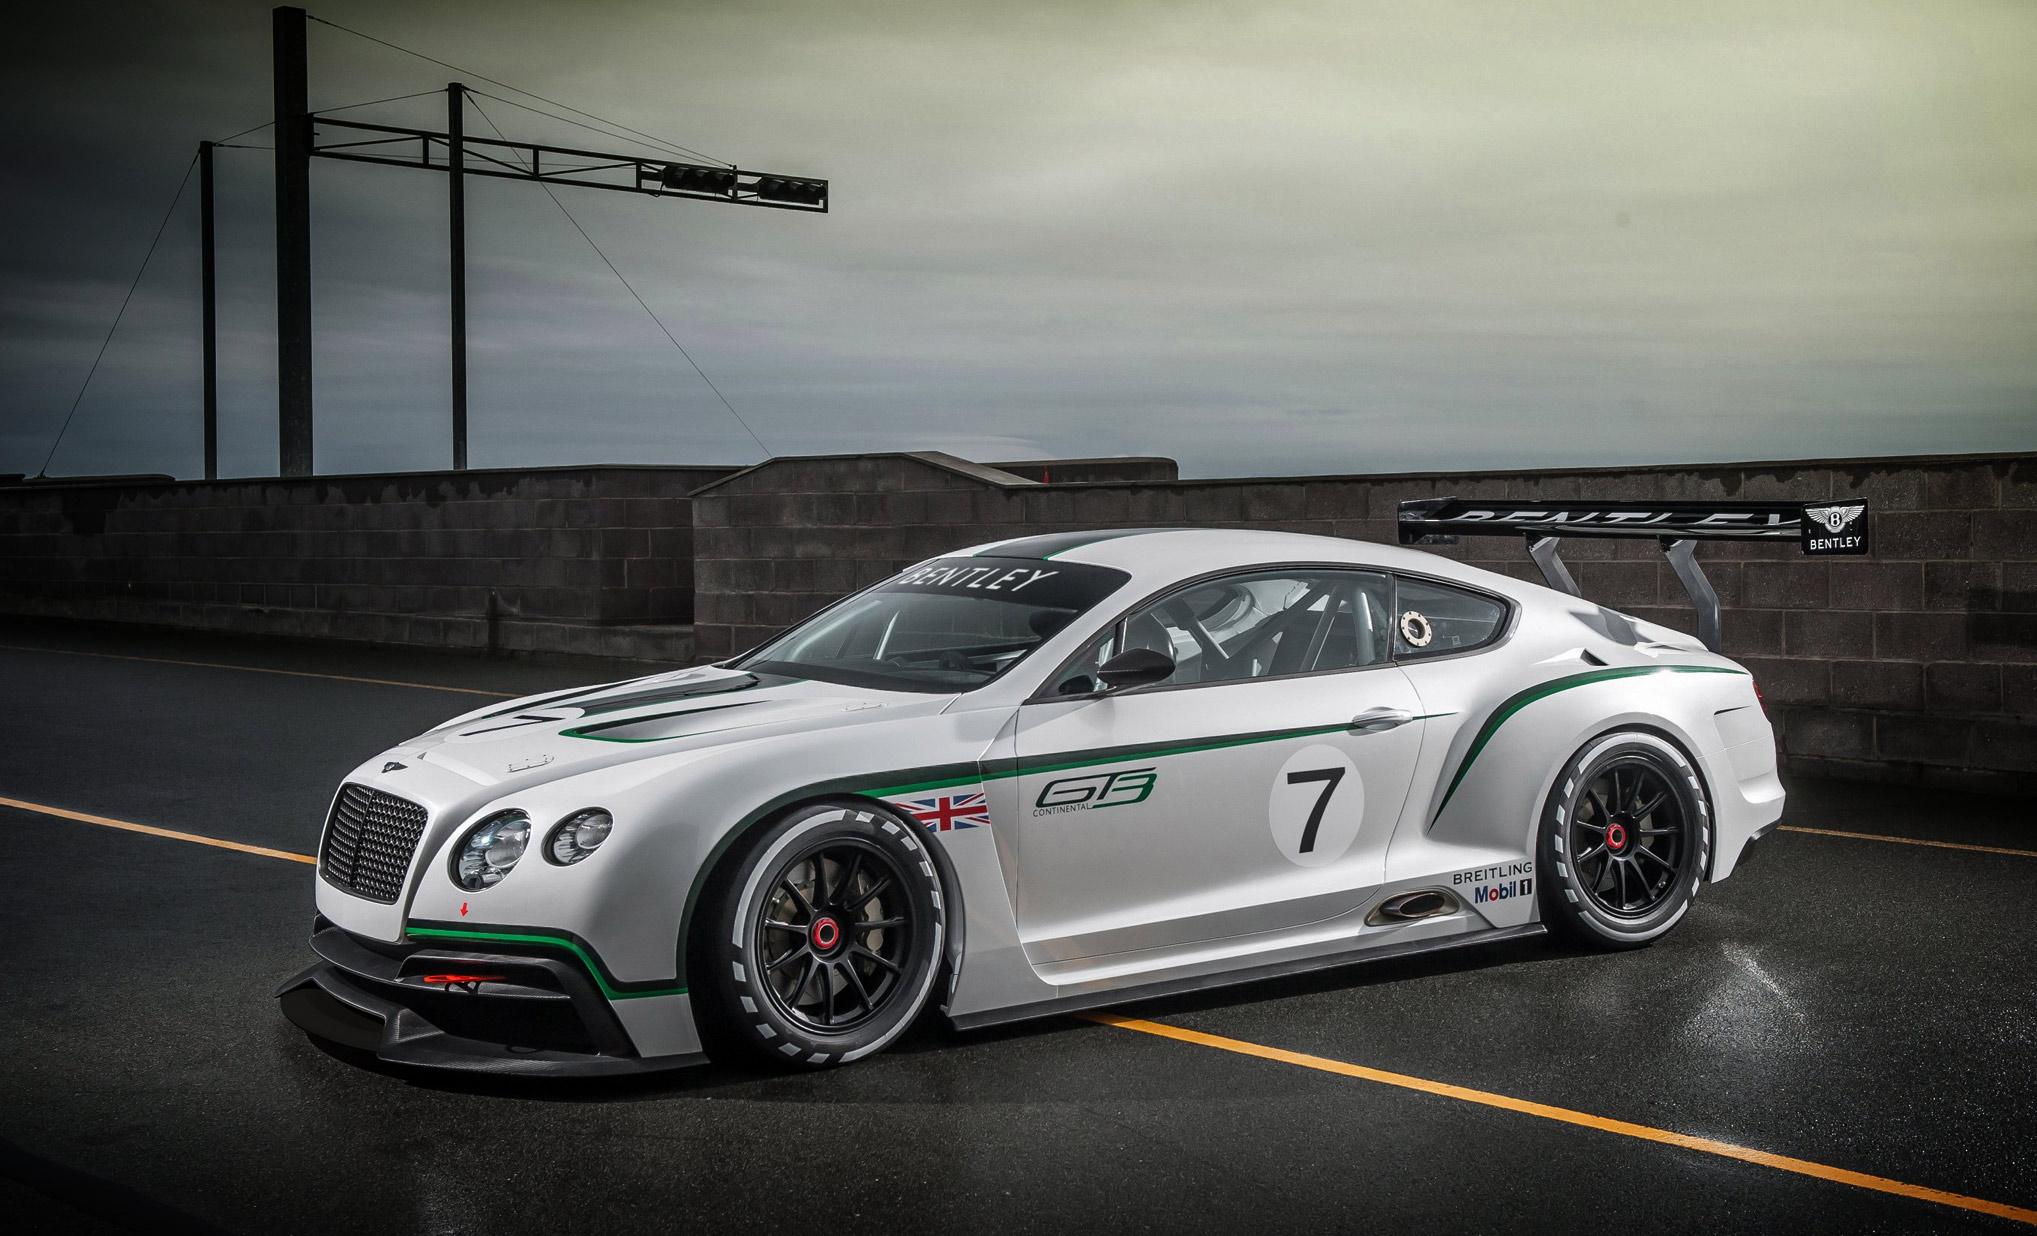 Bentley Continental GT3 Race Car - VWVortex